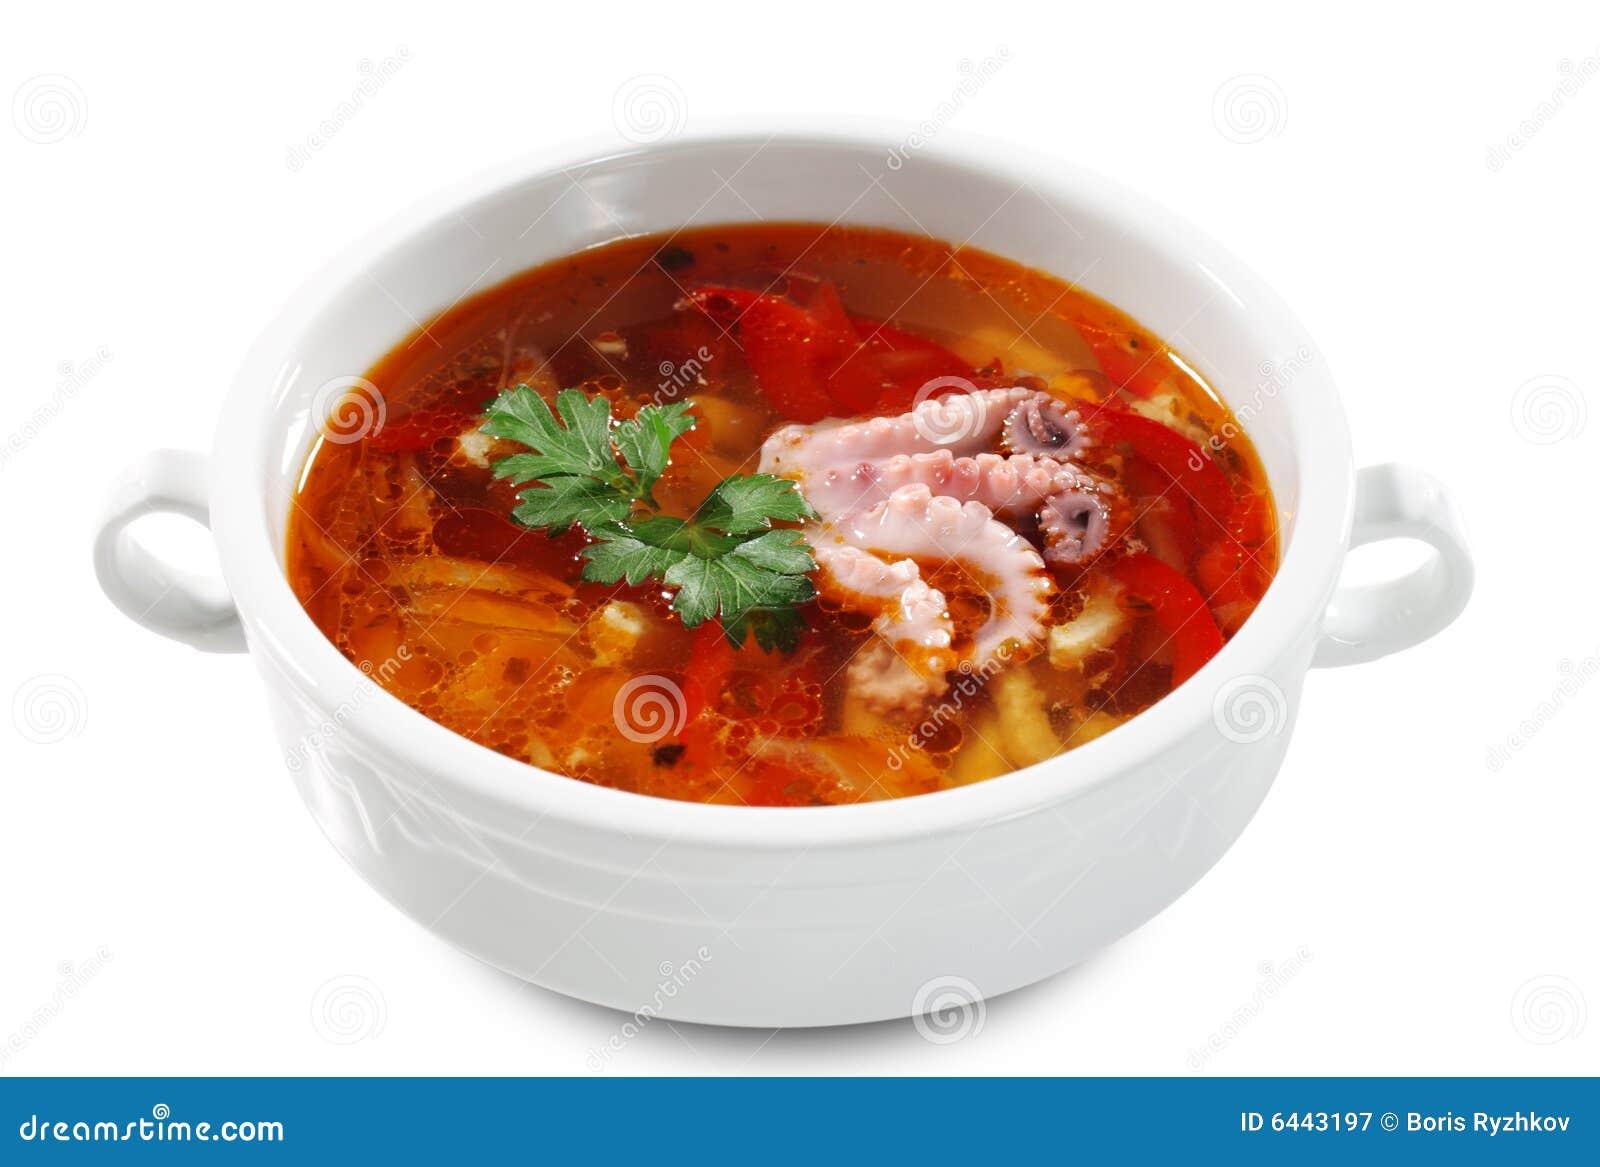 Russian and Ukrainian Cuisine - Fish Solyanka